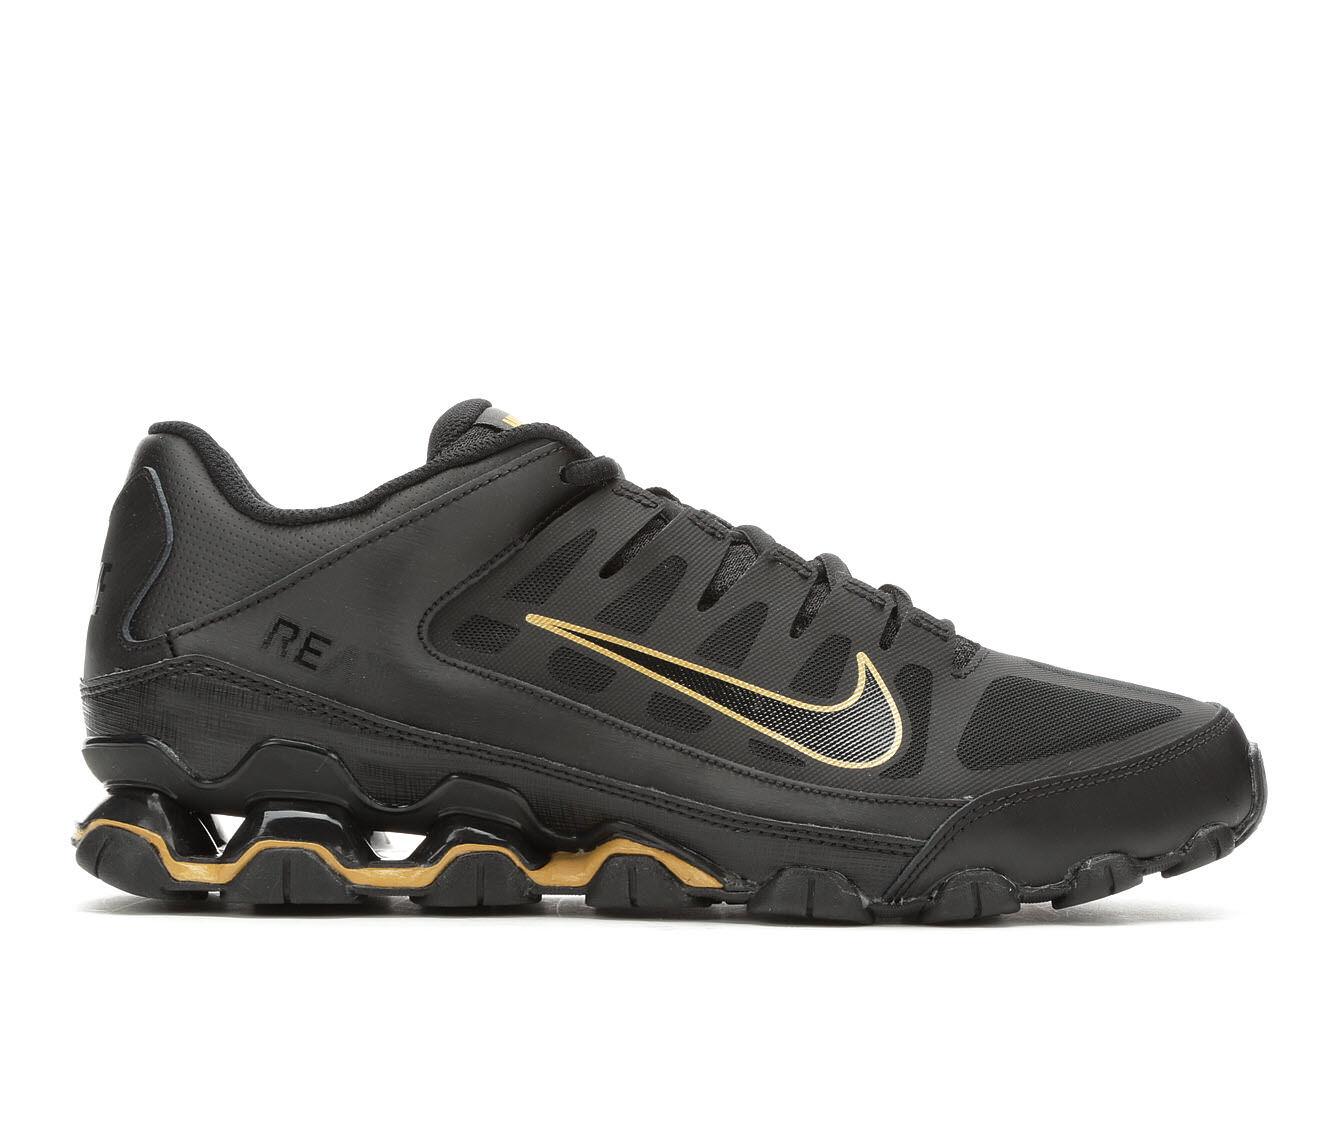 Cost Charm Men's Nike Reax 8 TR Mesh Training Shoes Blk/Gld 020